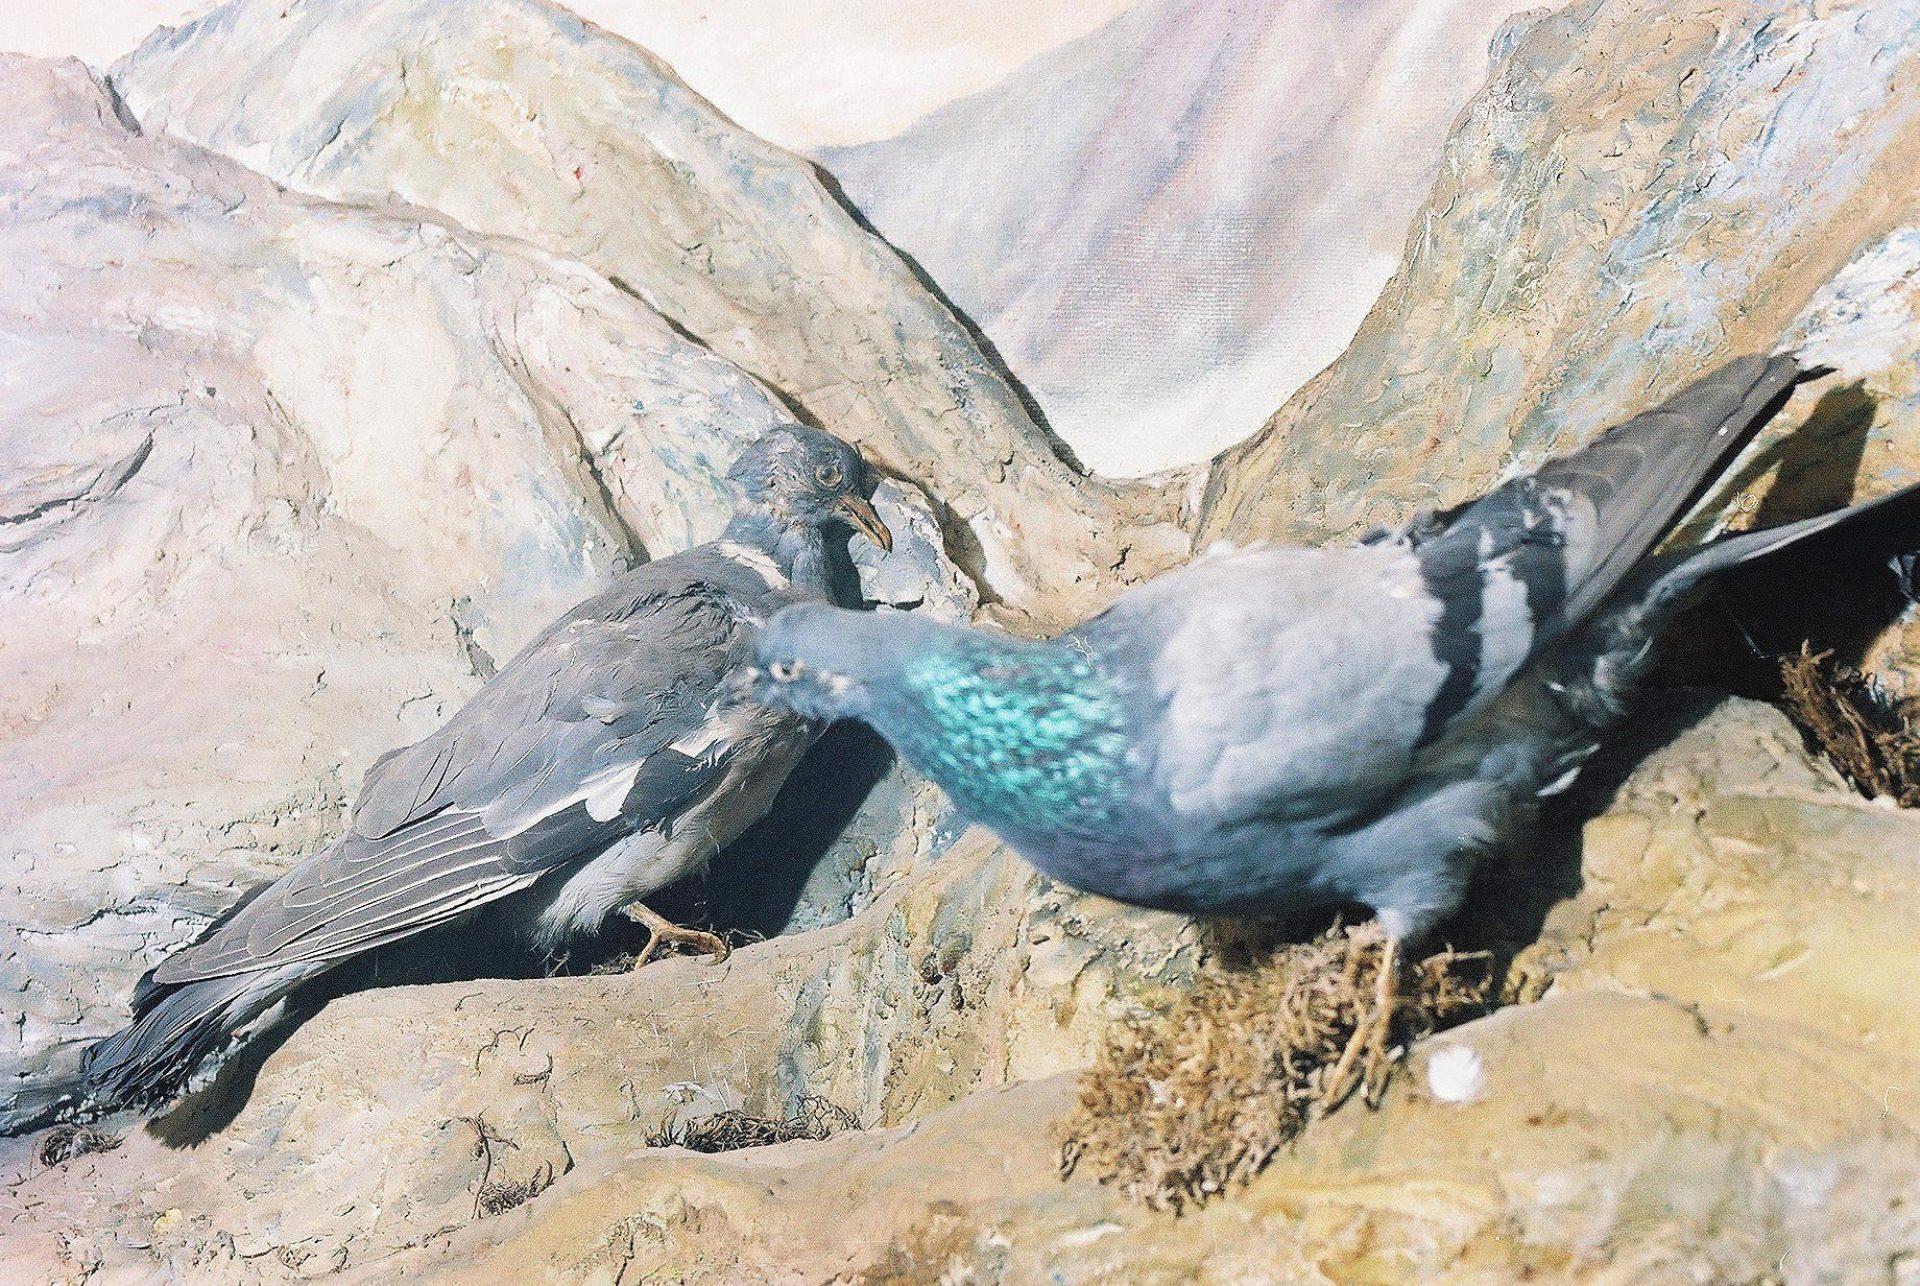 Petrit Halilaj, Special Edition (ex-Natural History Museum of Kosovo), 2013 (28/80)